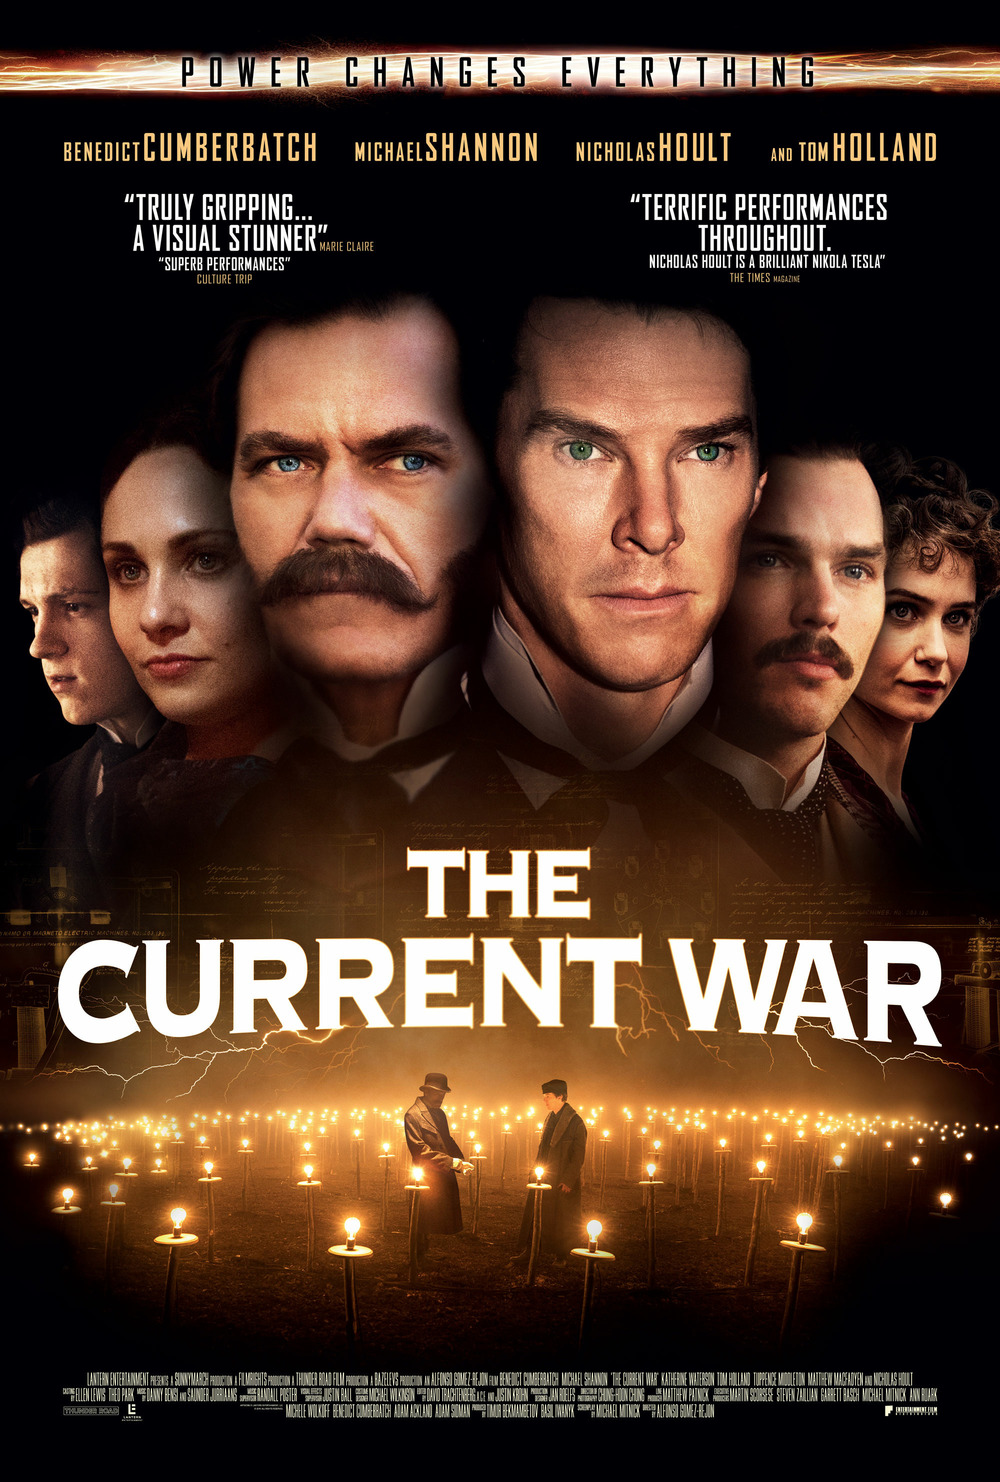 The Current War Trailer